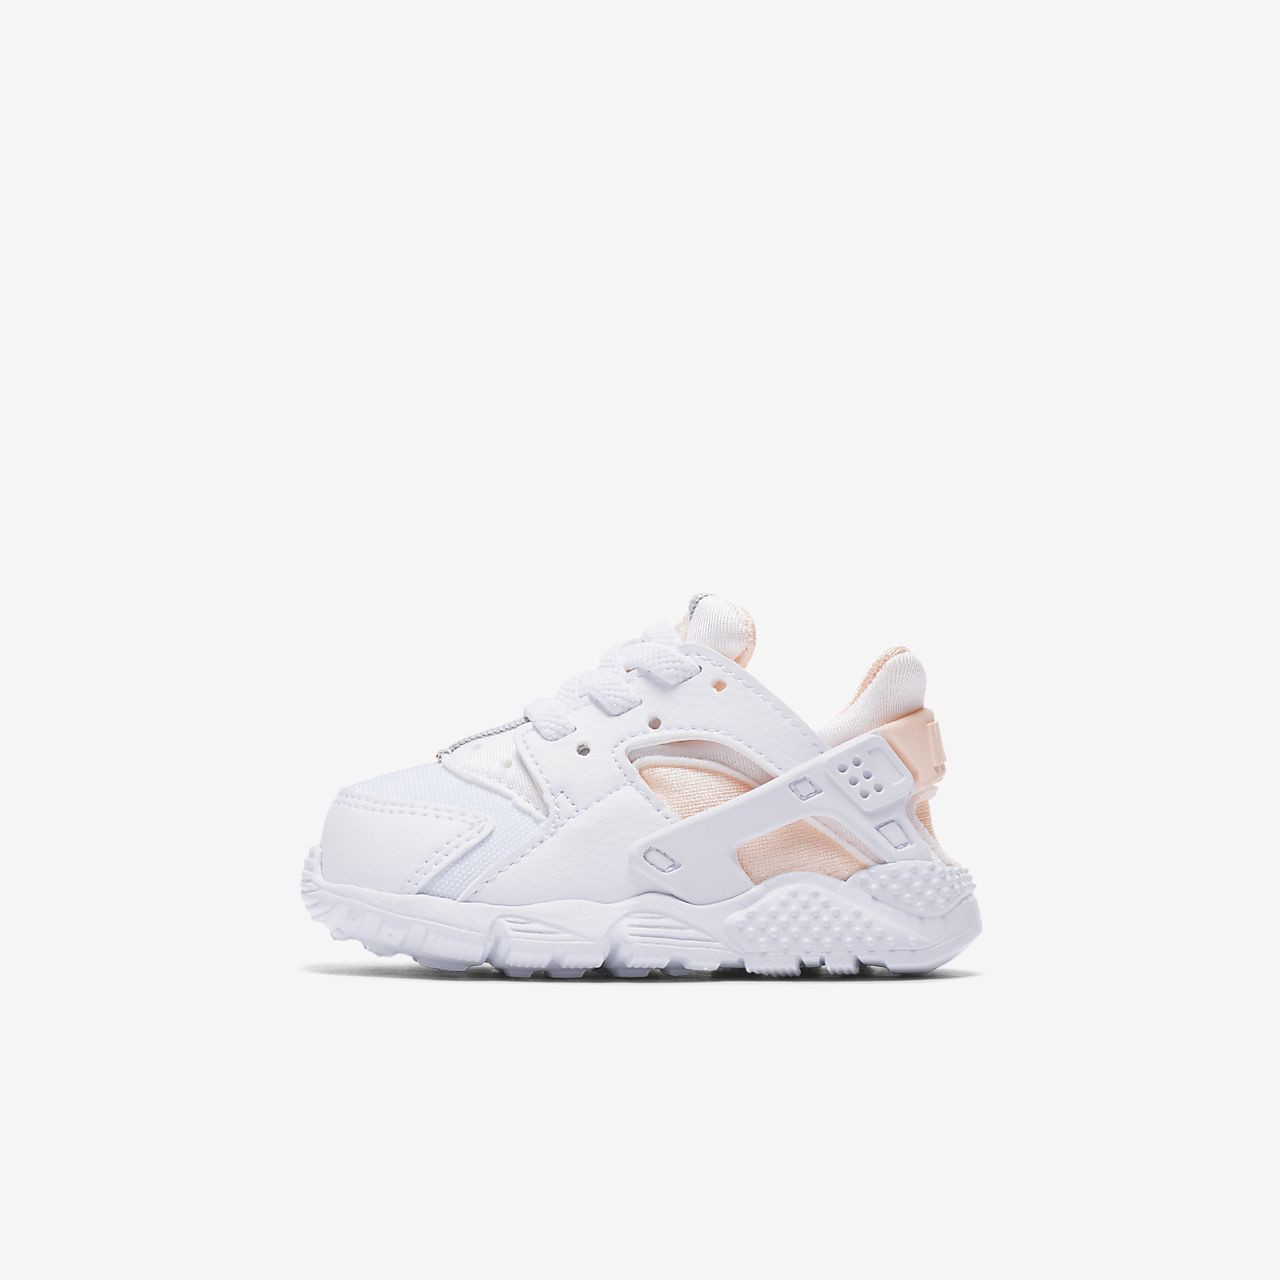 4e02aa125869 Nike Huarache Infant Toddler Shoe - 2C